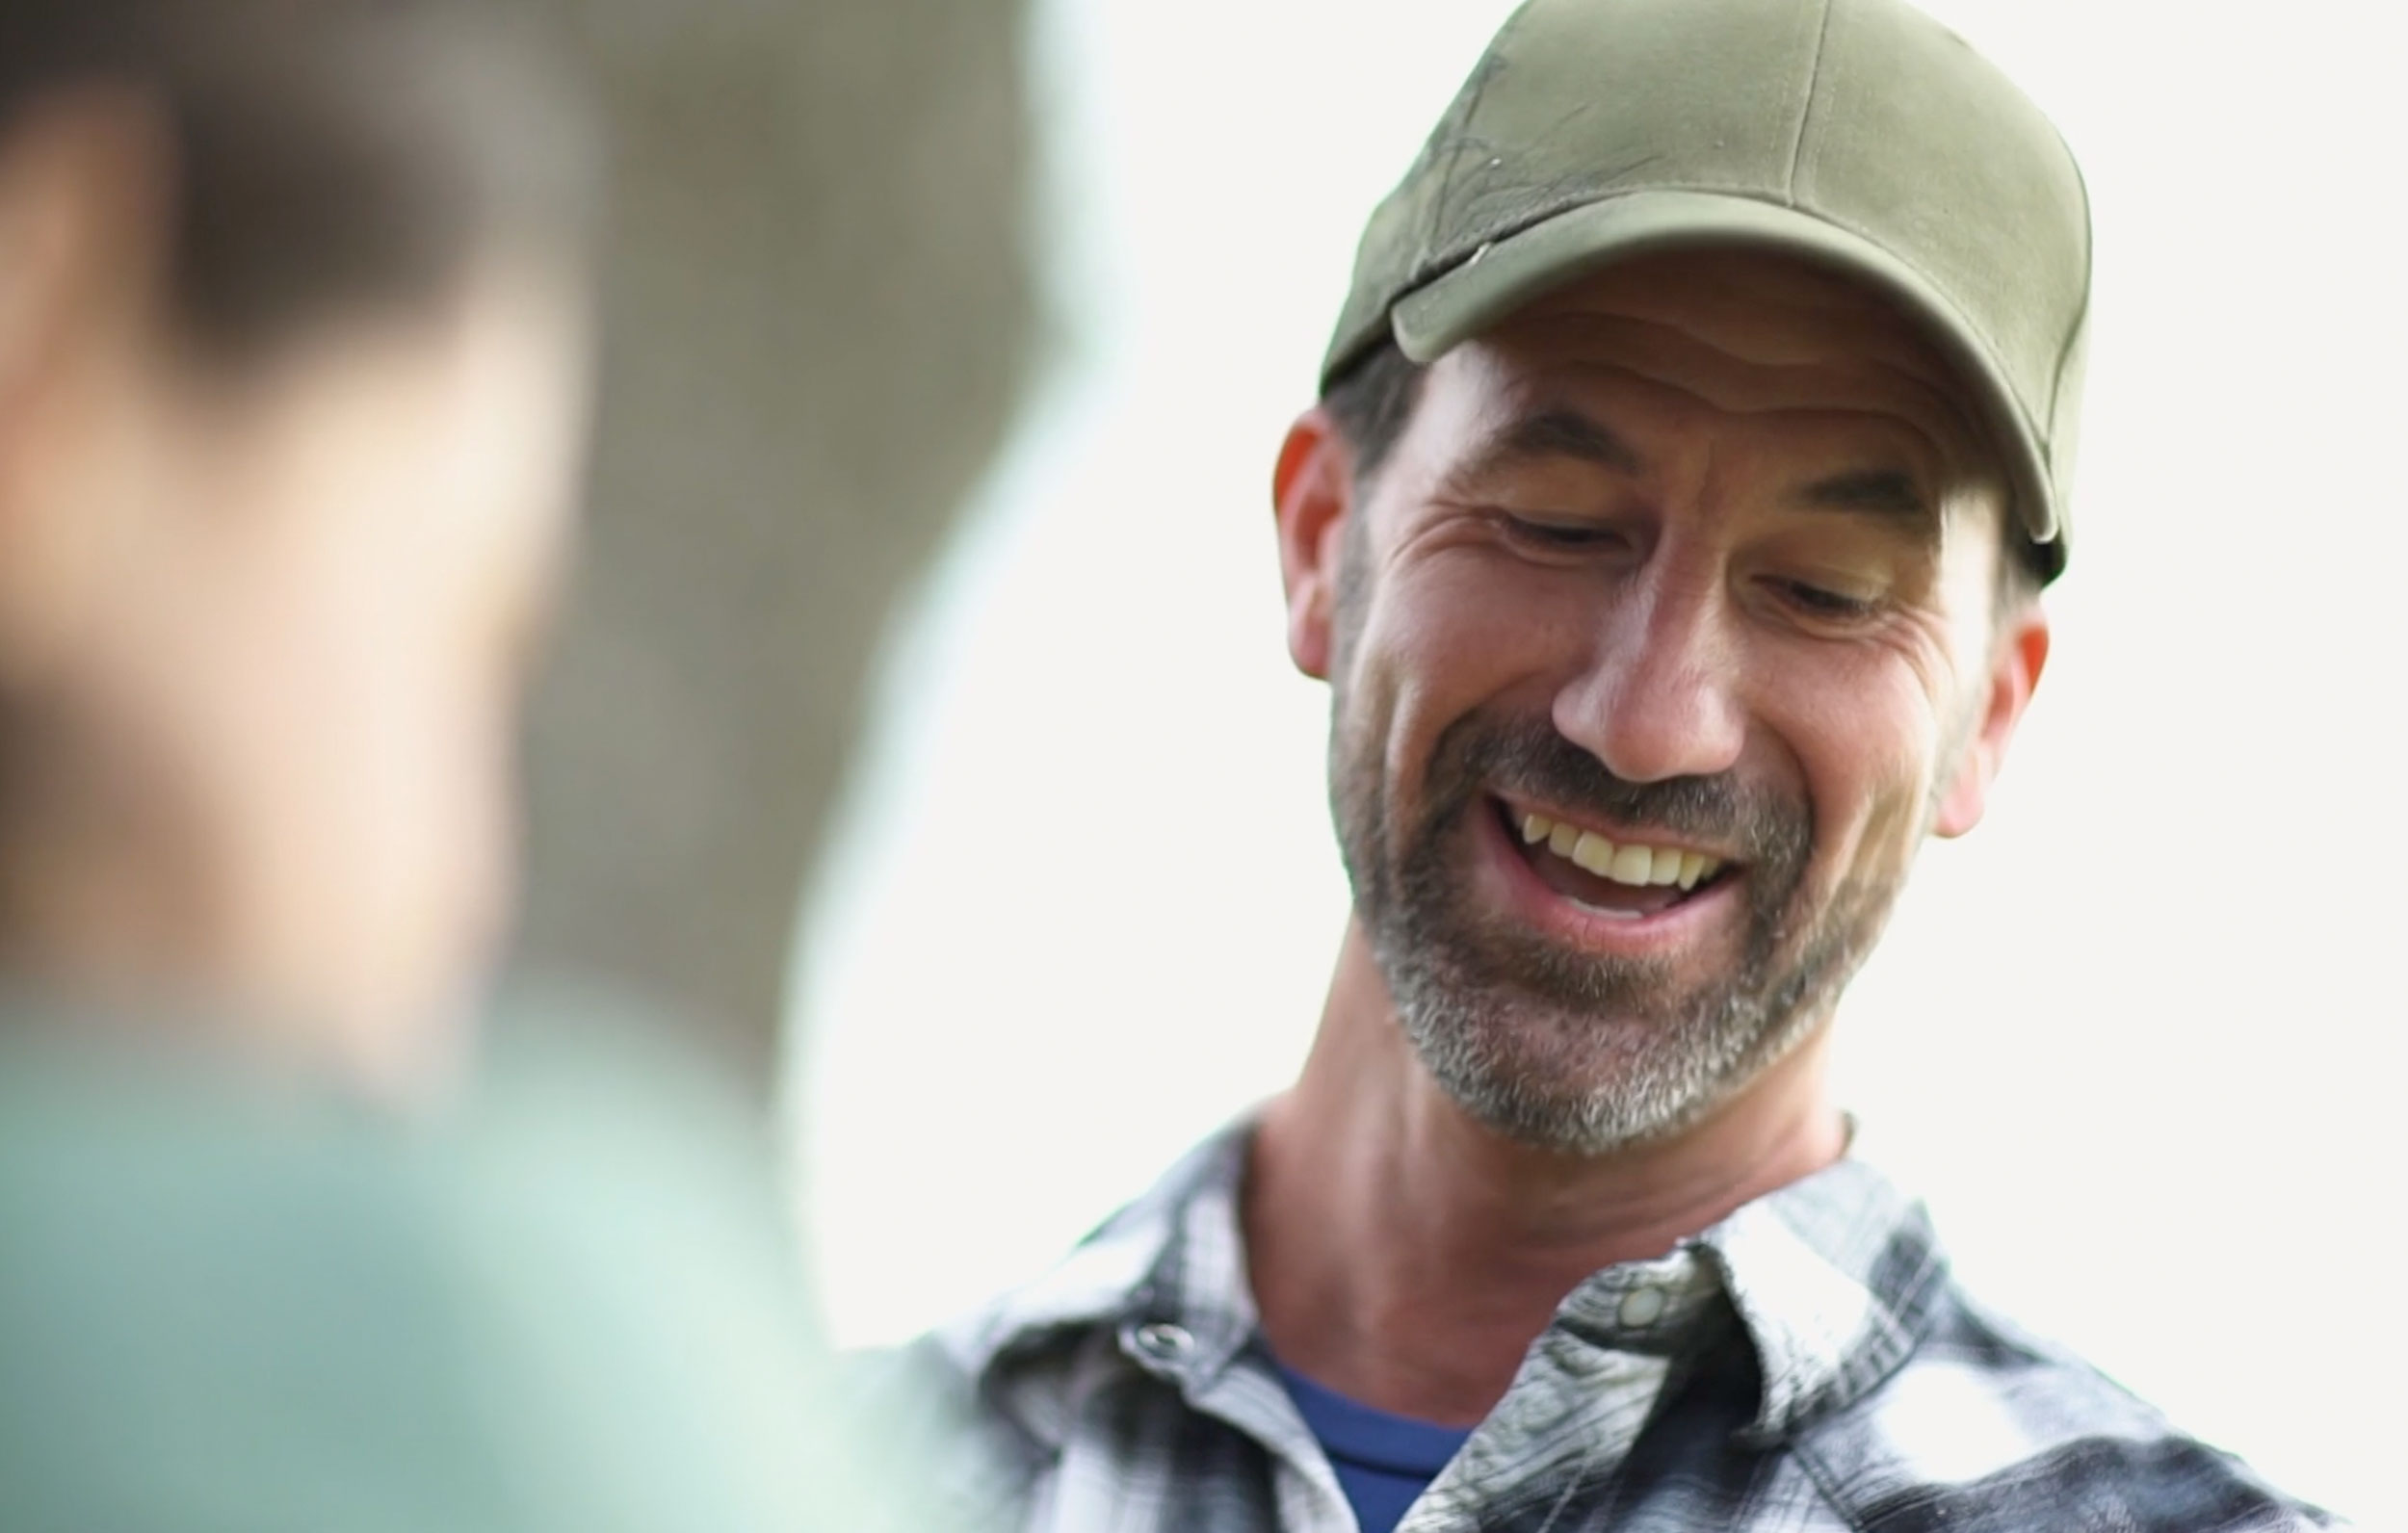 Farmer smiles